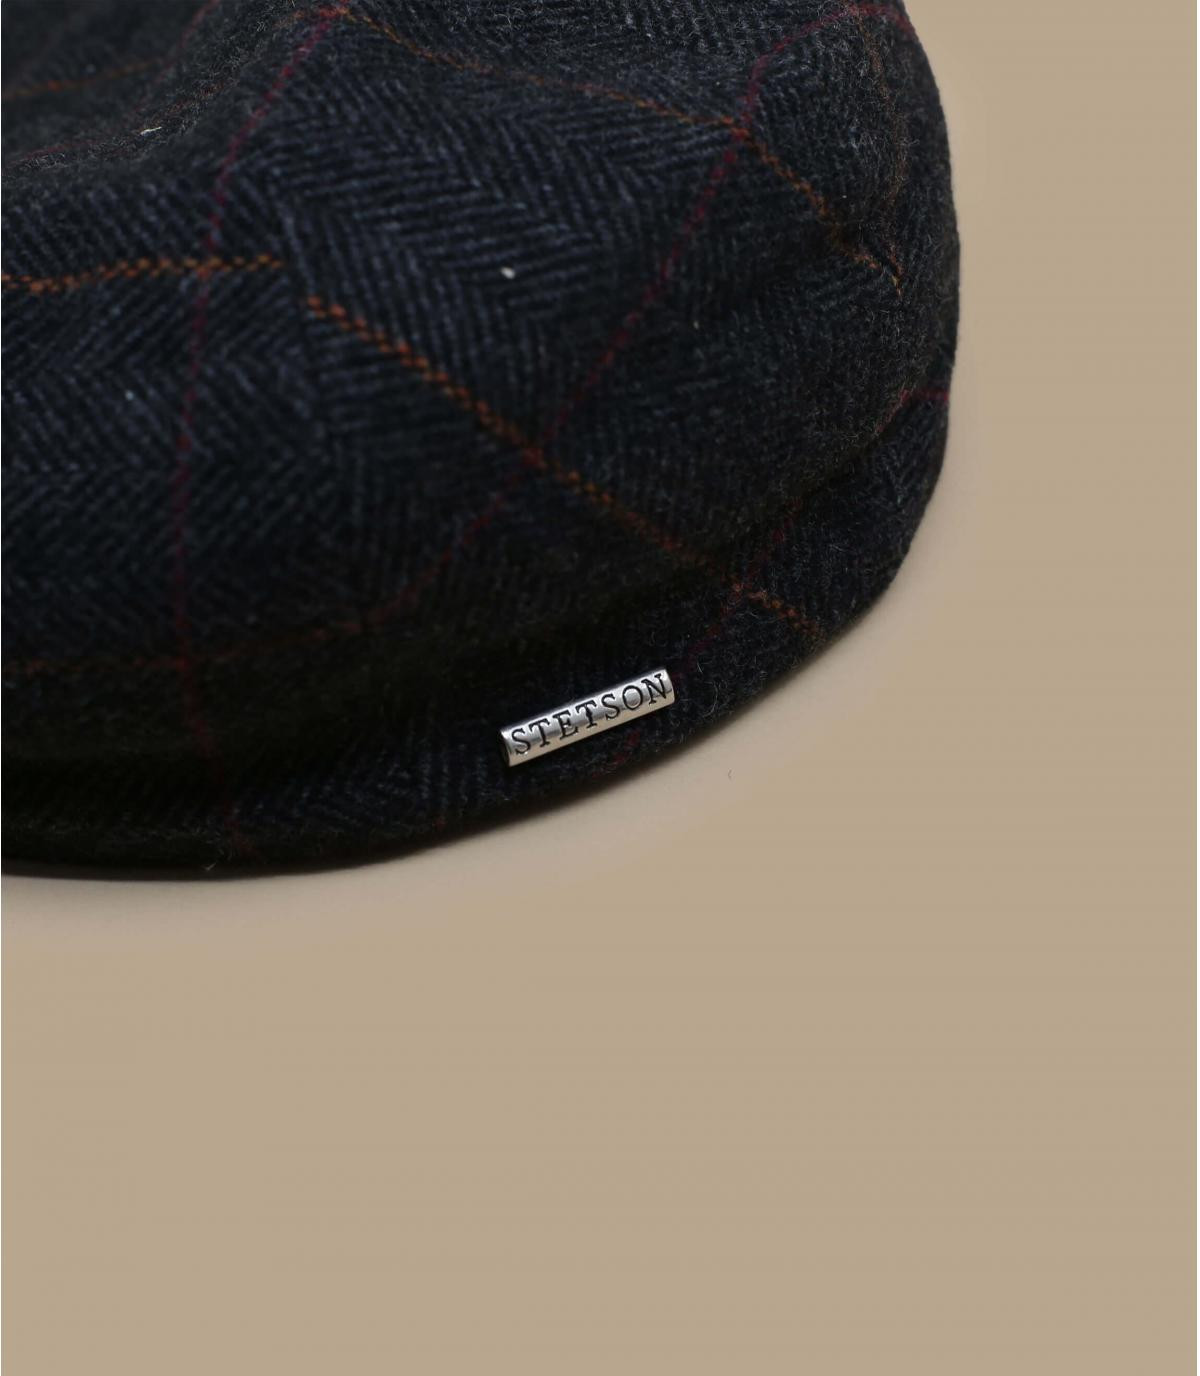 24fc7abdf8c40 Flat cap earflap - Kent wool Earflap grey by Stetson. Headict